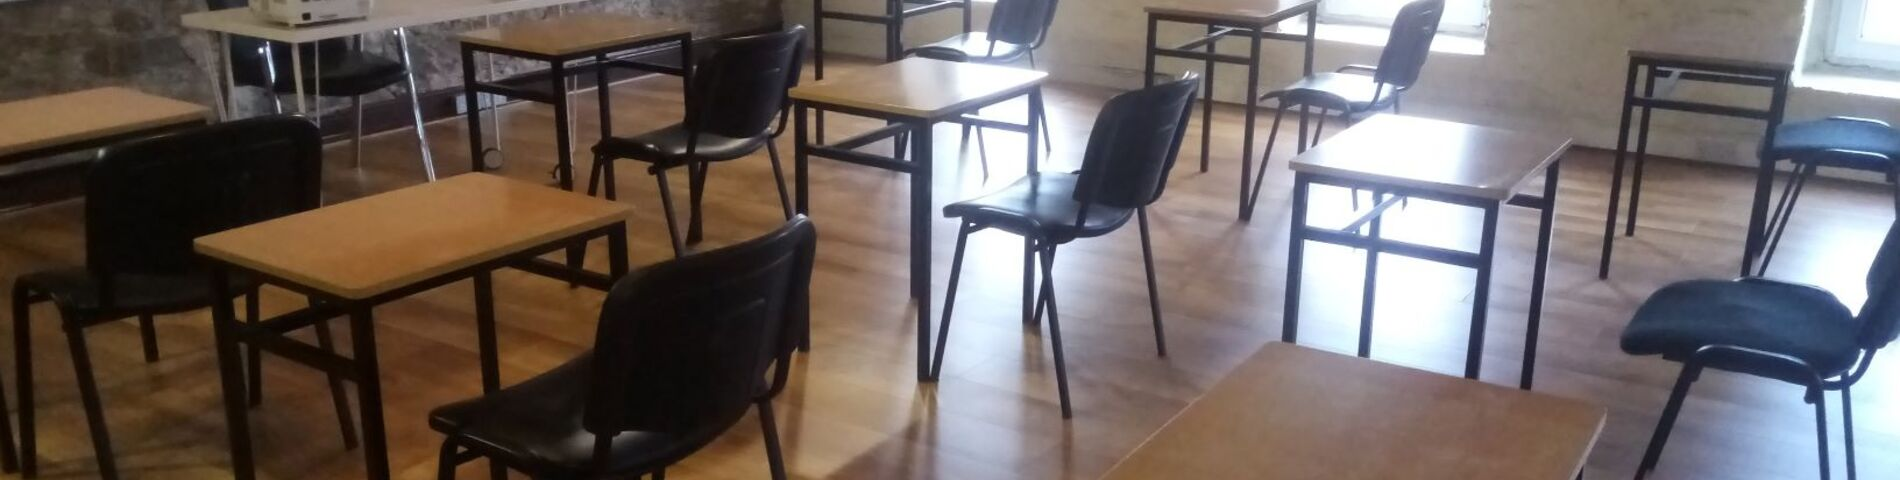 Cork English Academy Bild 1